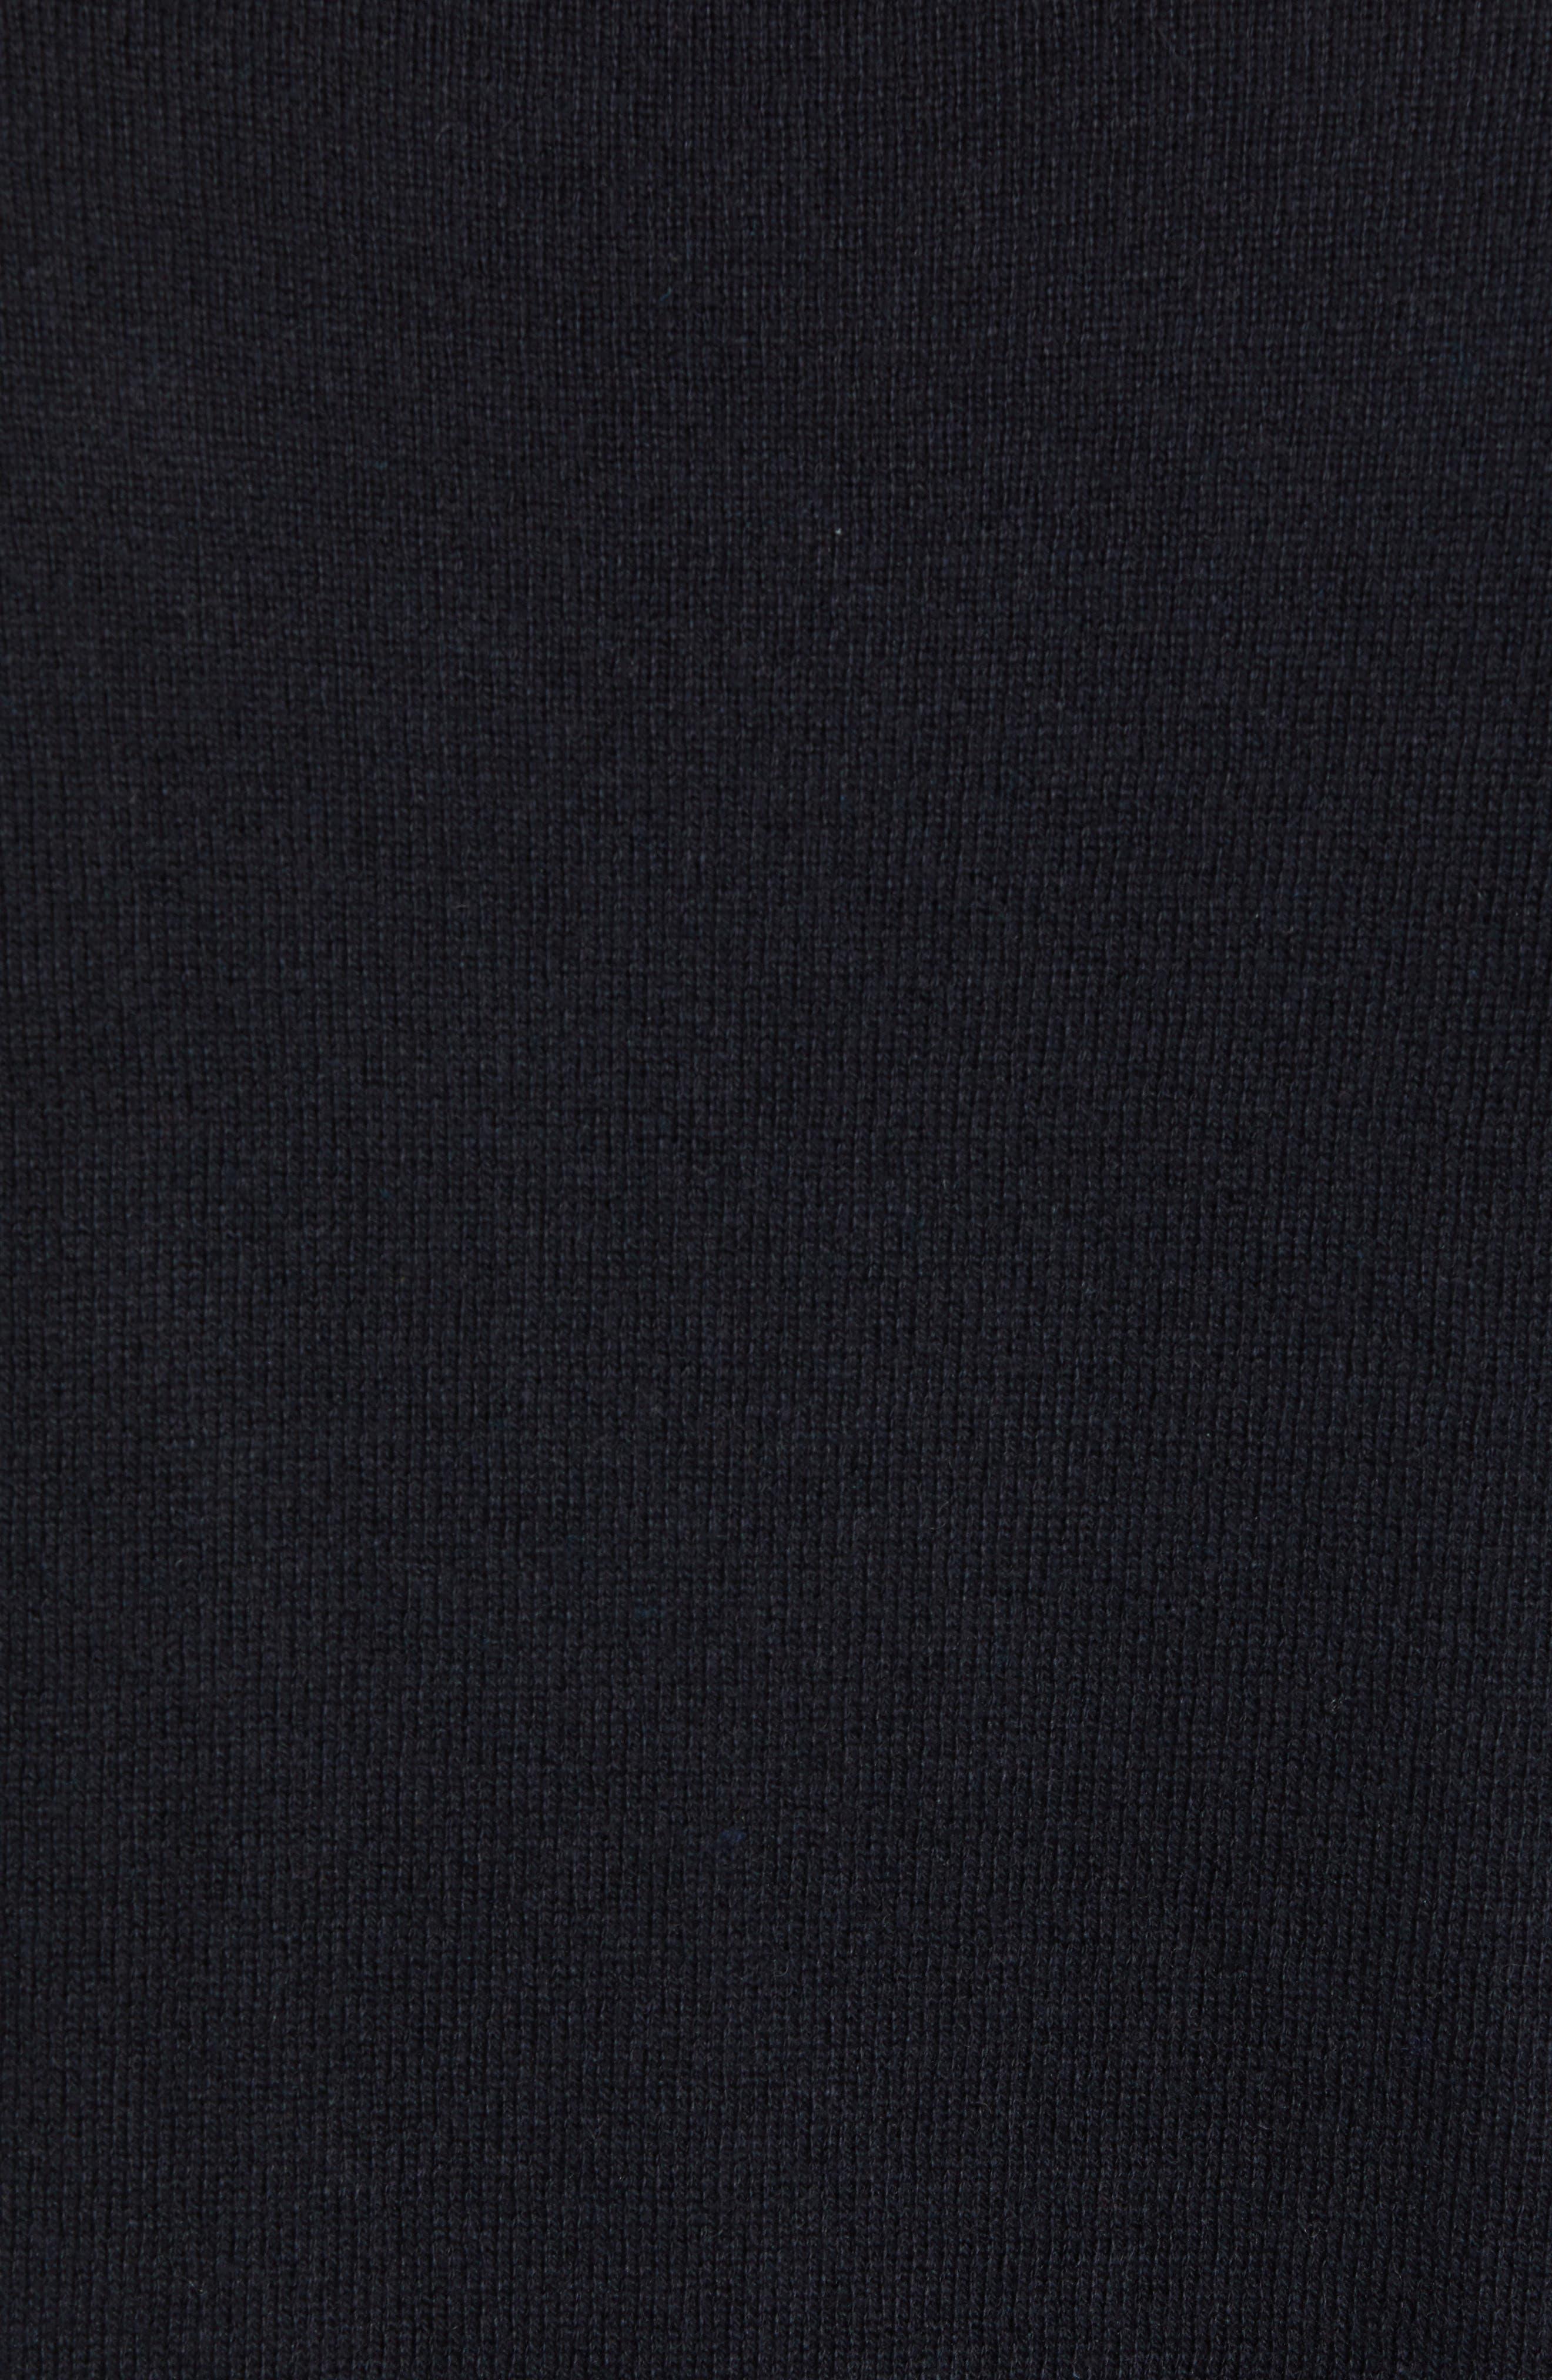 Tournament Slim Fit Crewneck Sweater,                             Alternate thumbnail 5, color,                             BLACK